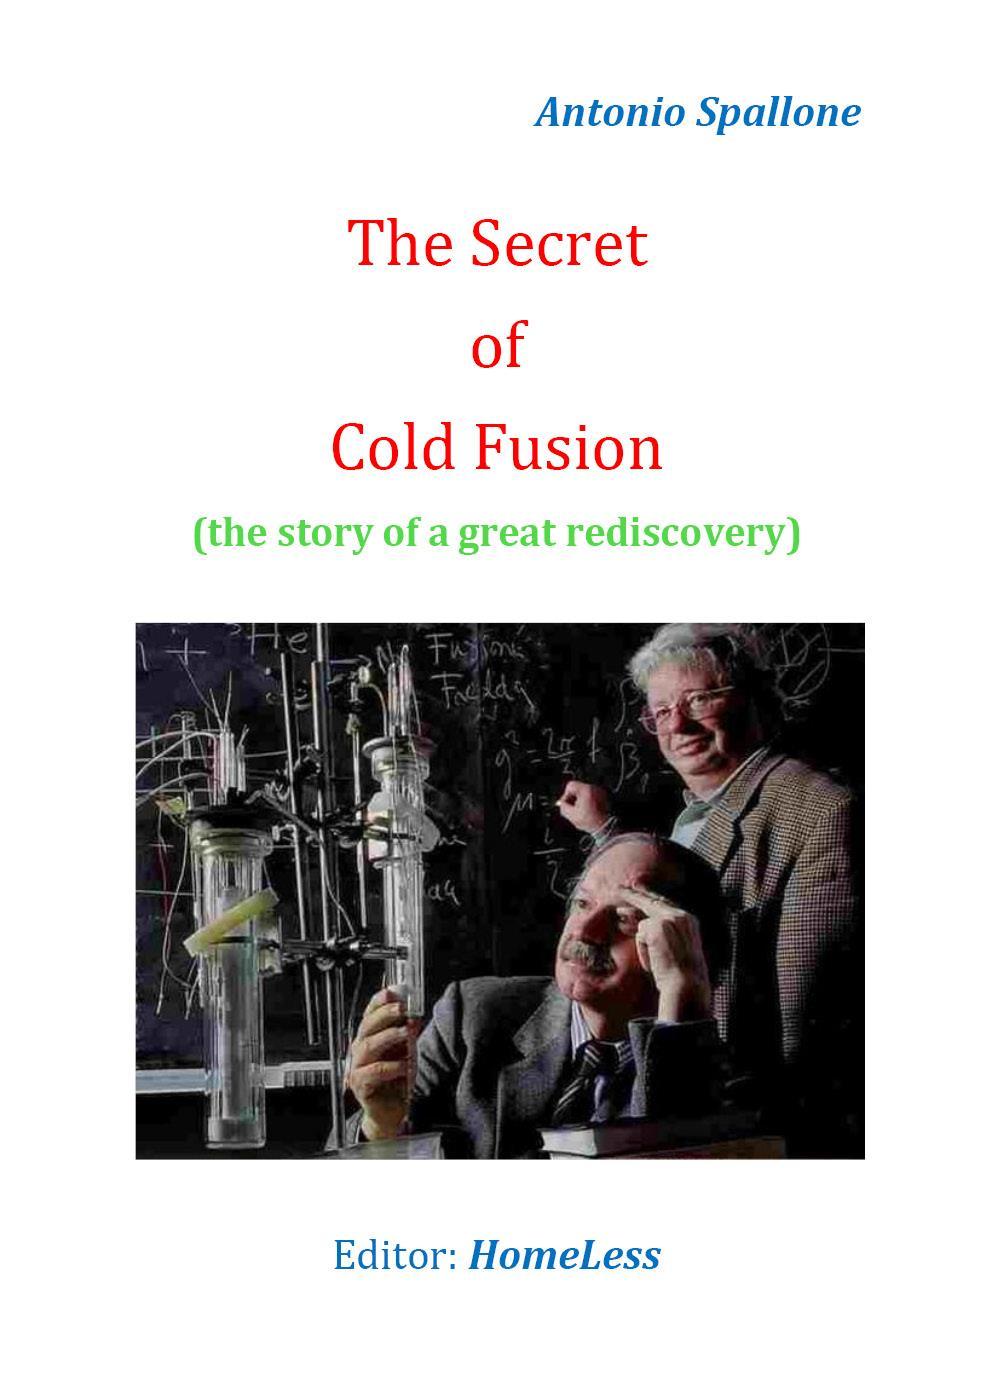 The Secret of Cold Fusion